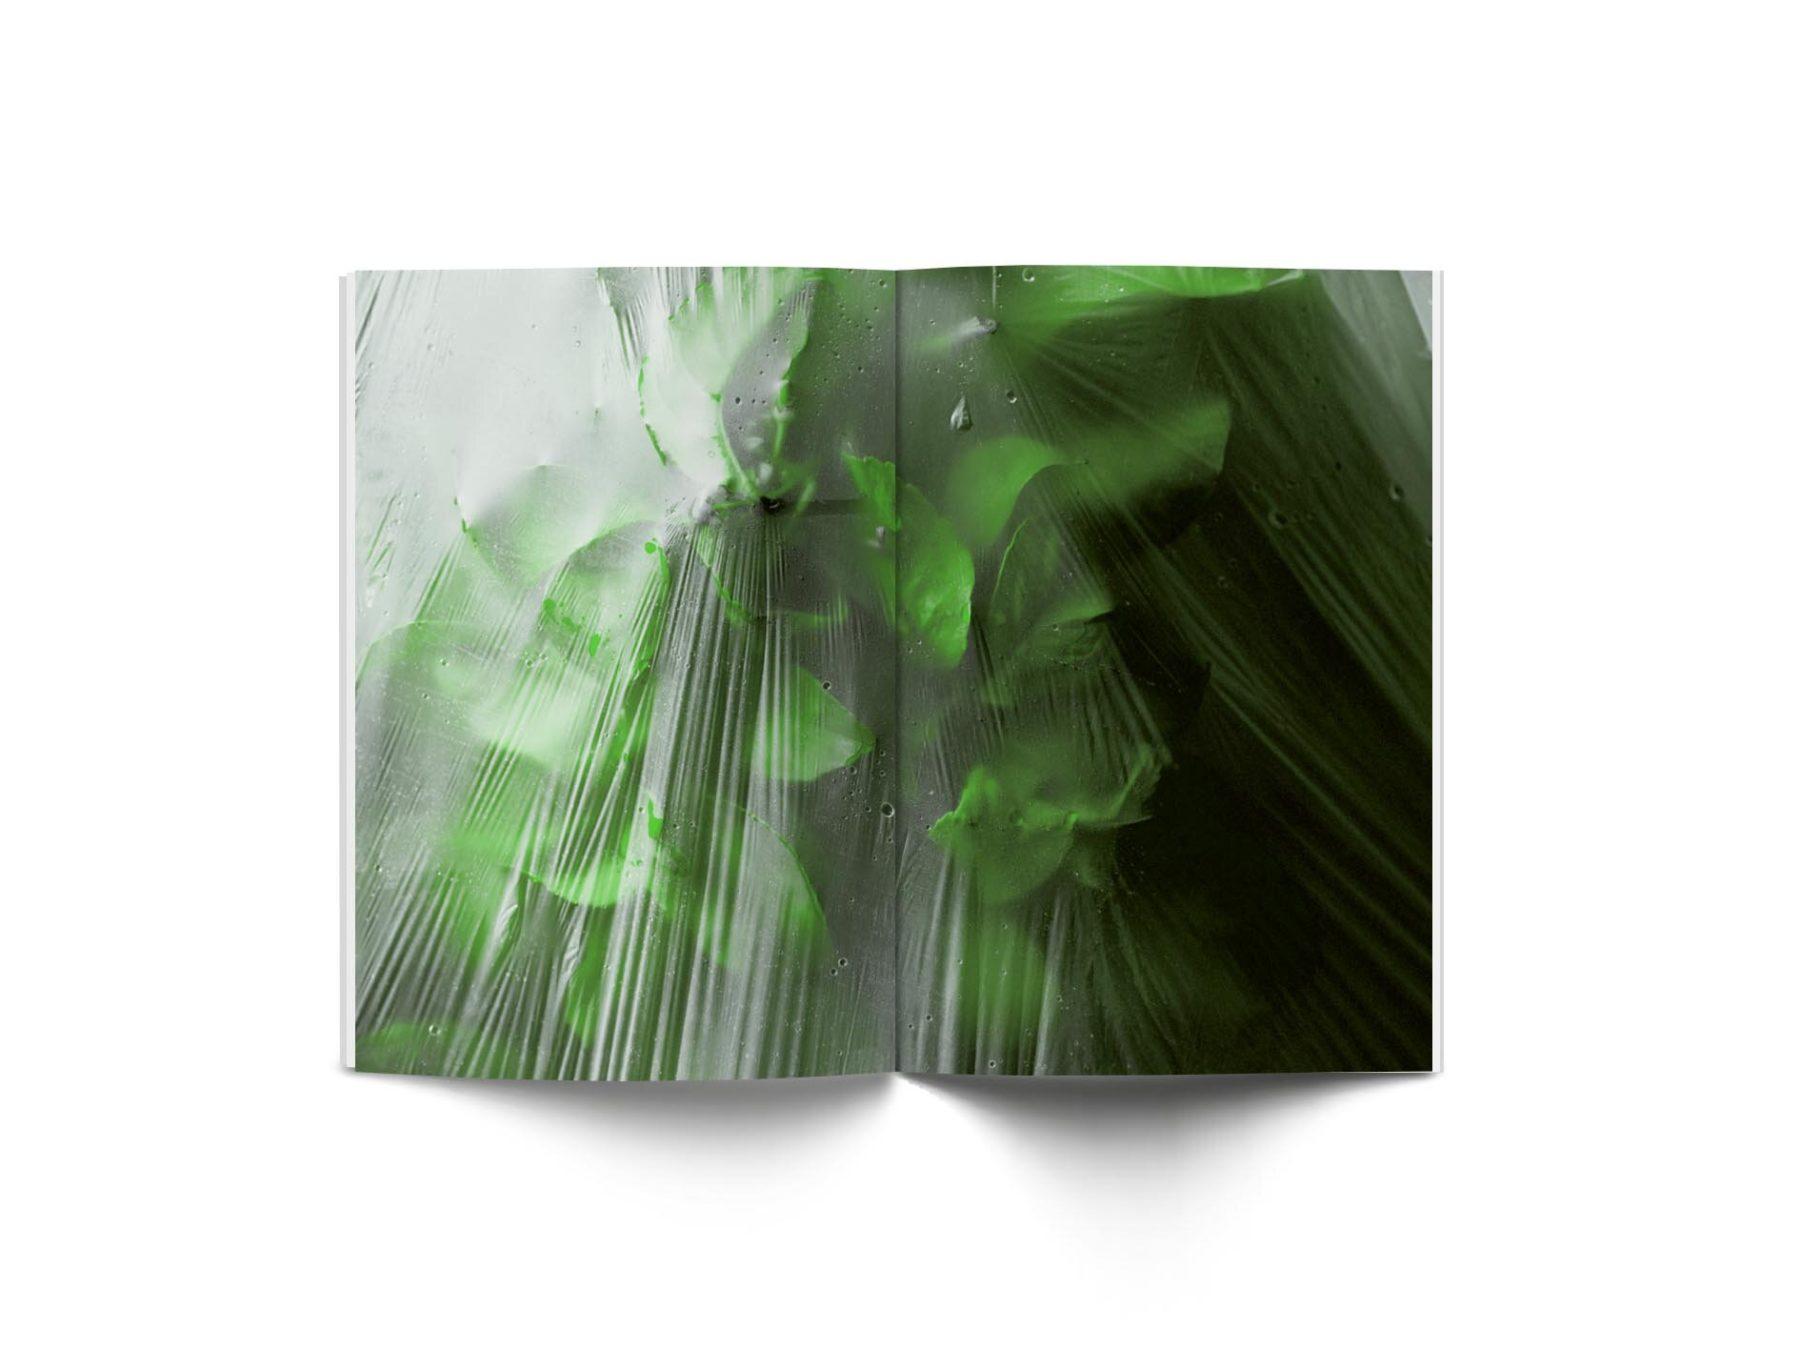 sindroms green 8